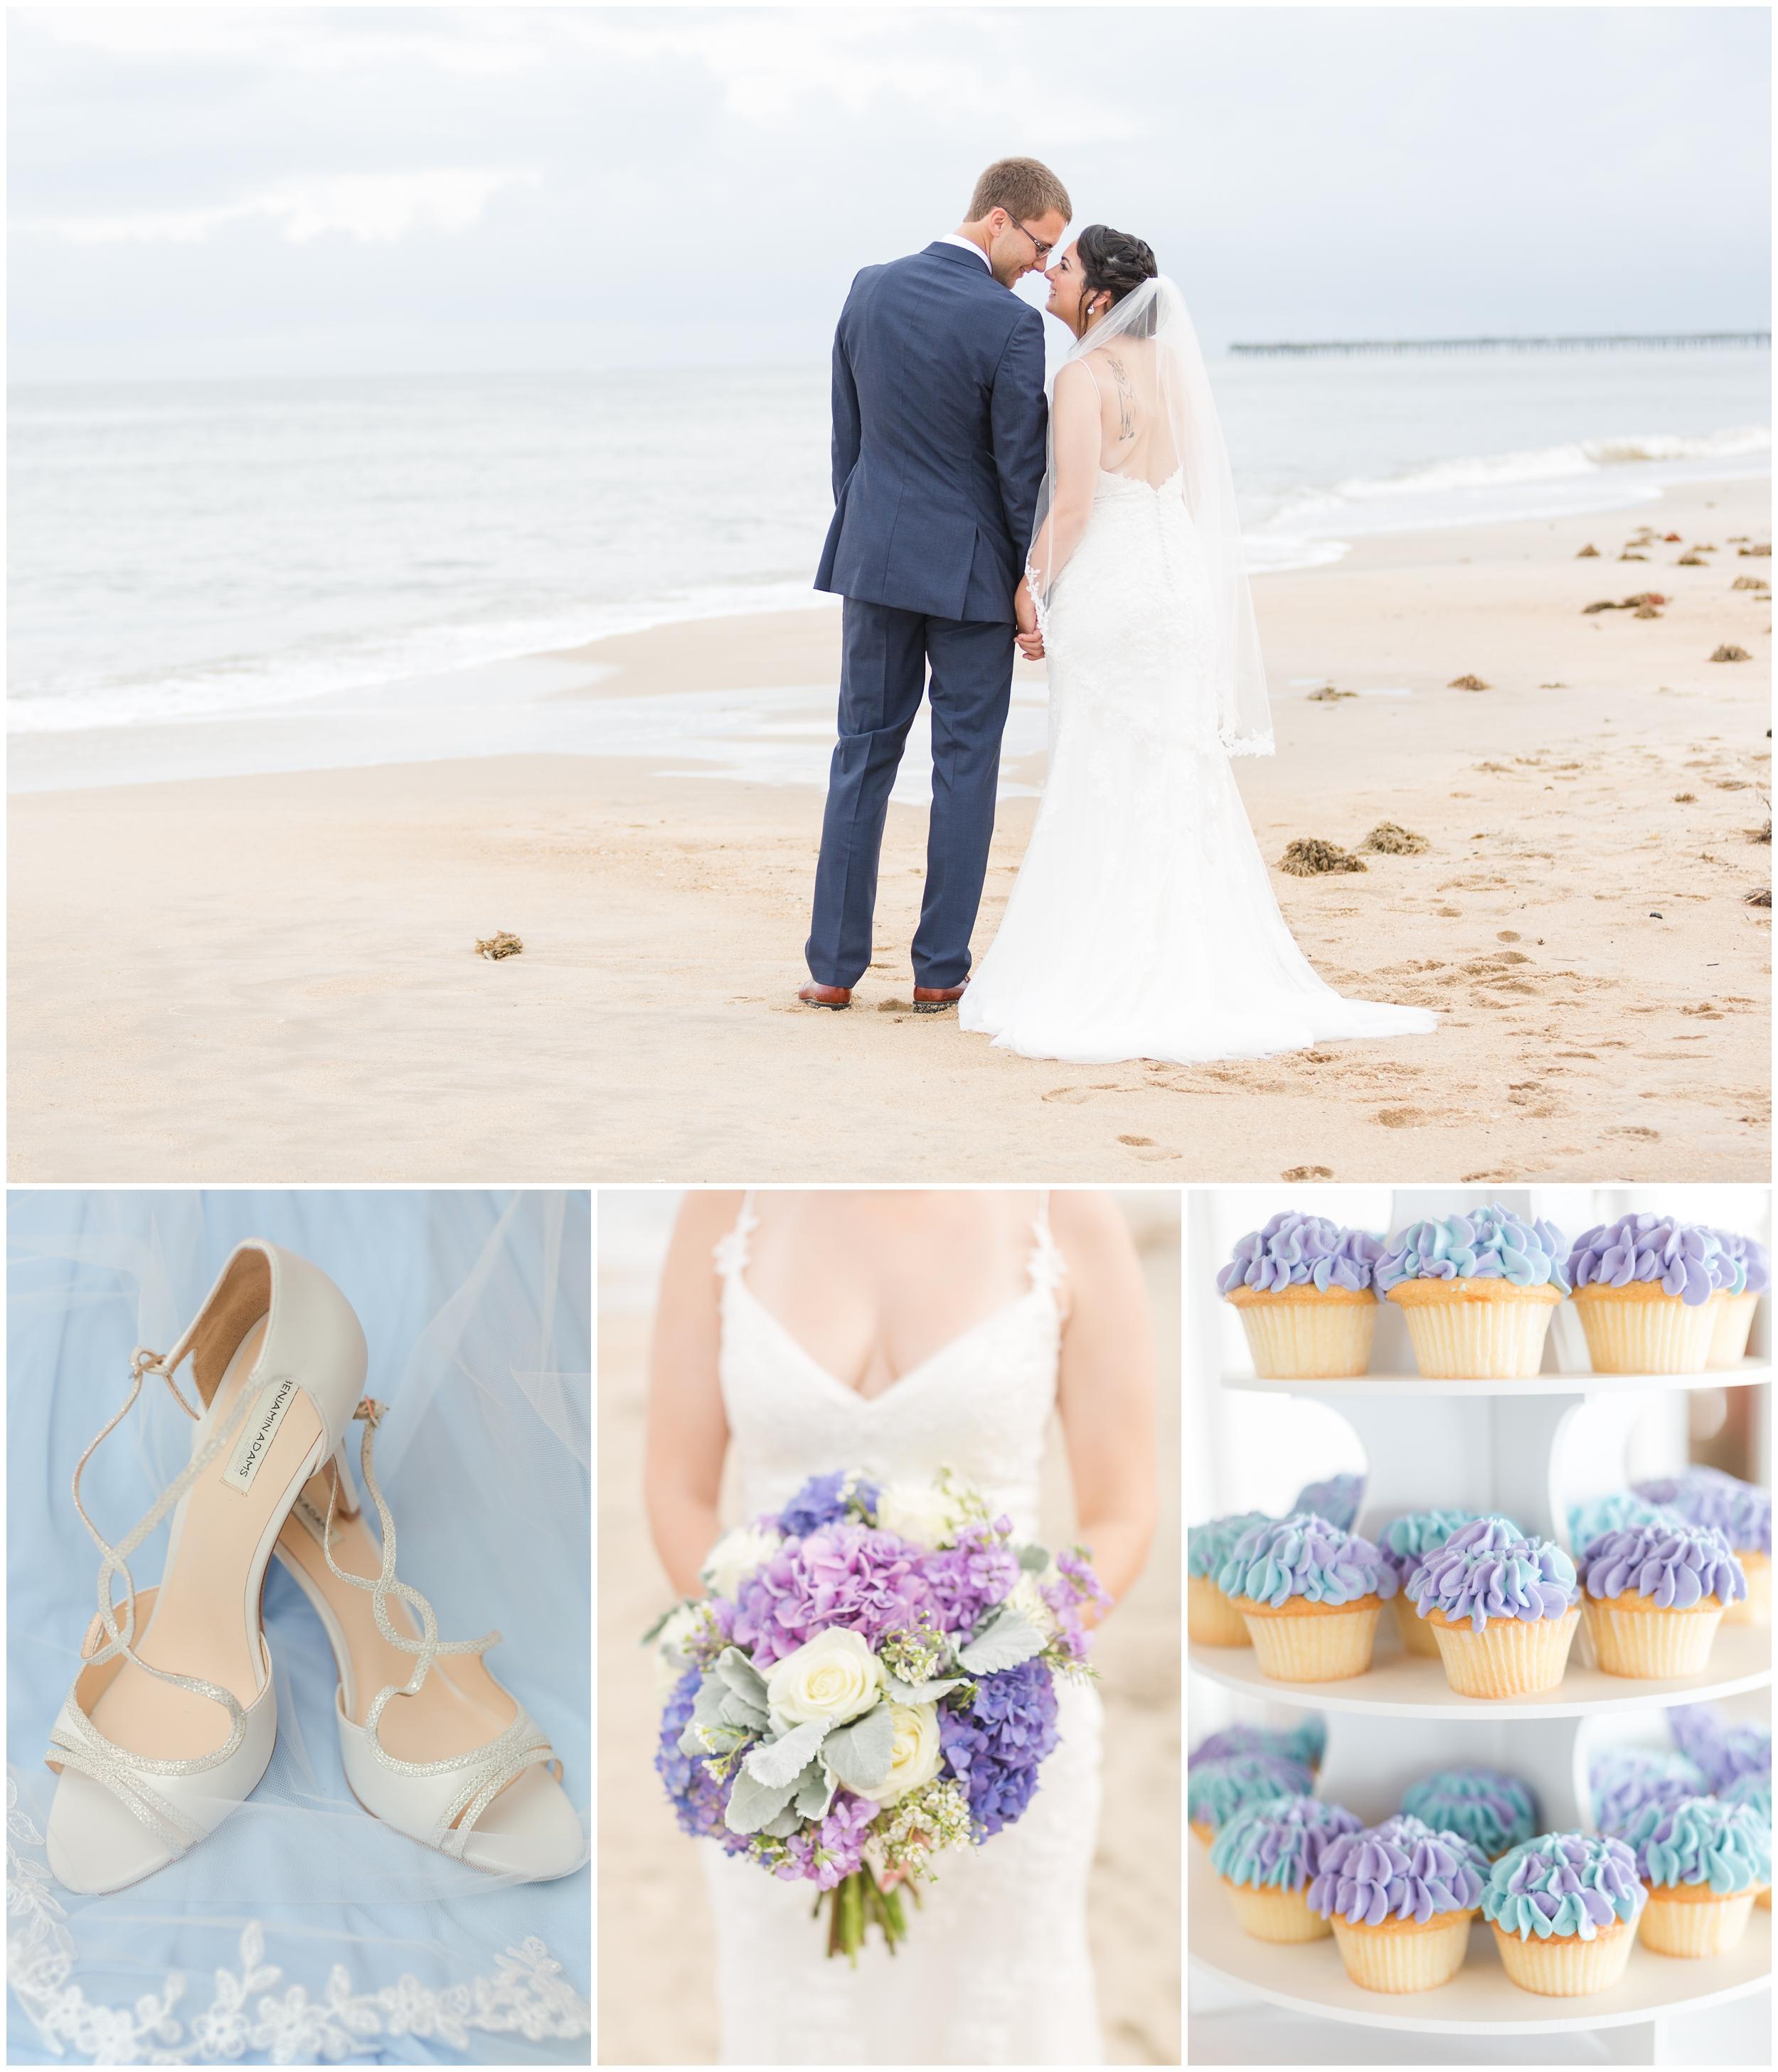 elovephotos_lesner_inn_virginia_beach_blue_violet_white_beach_wedding_0067.jpg